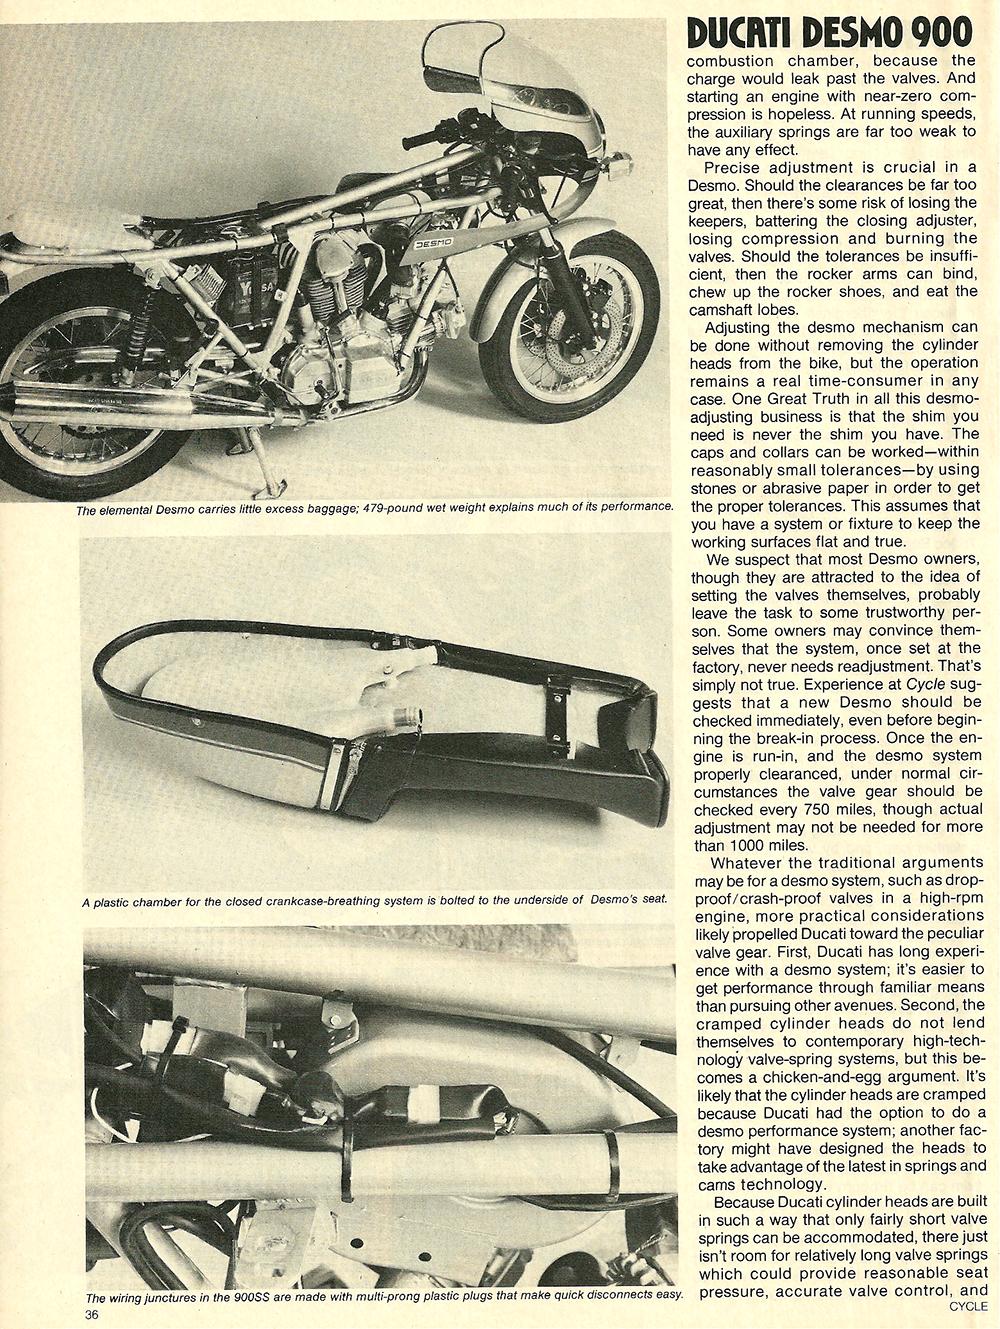 1978 Ducati Desmo 900 Super Sport road test 05.jpg